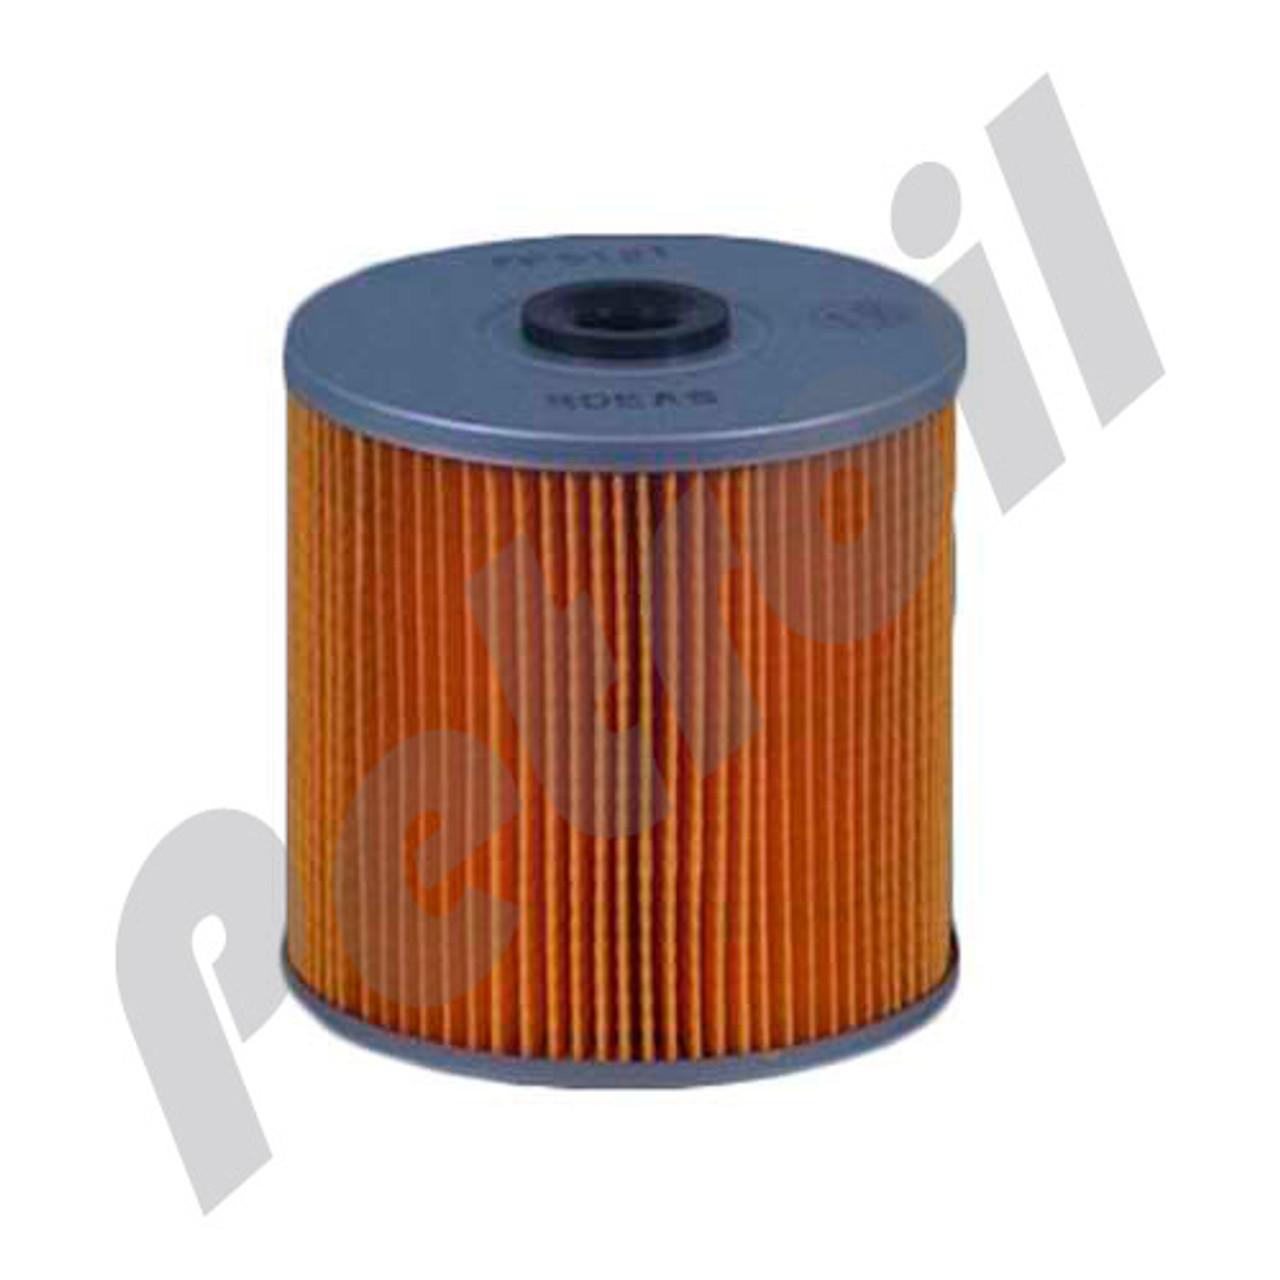 medium resolution of case of 12 ff5121 fleetguard fuel filter cartridge metal hinoshop by brand